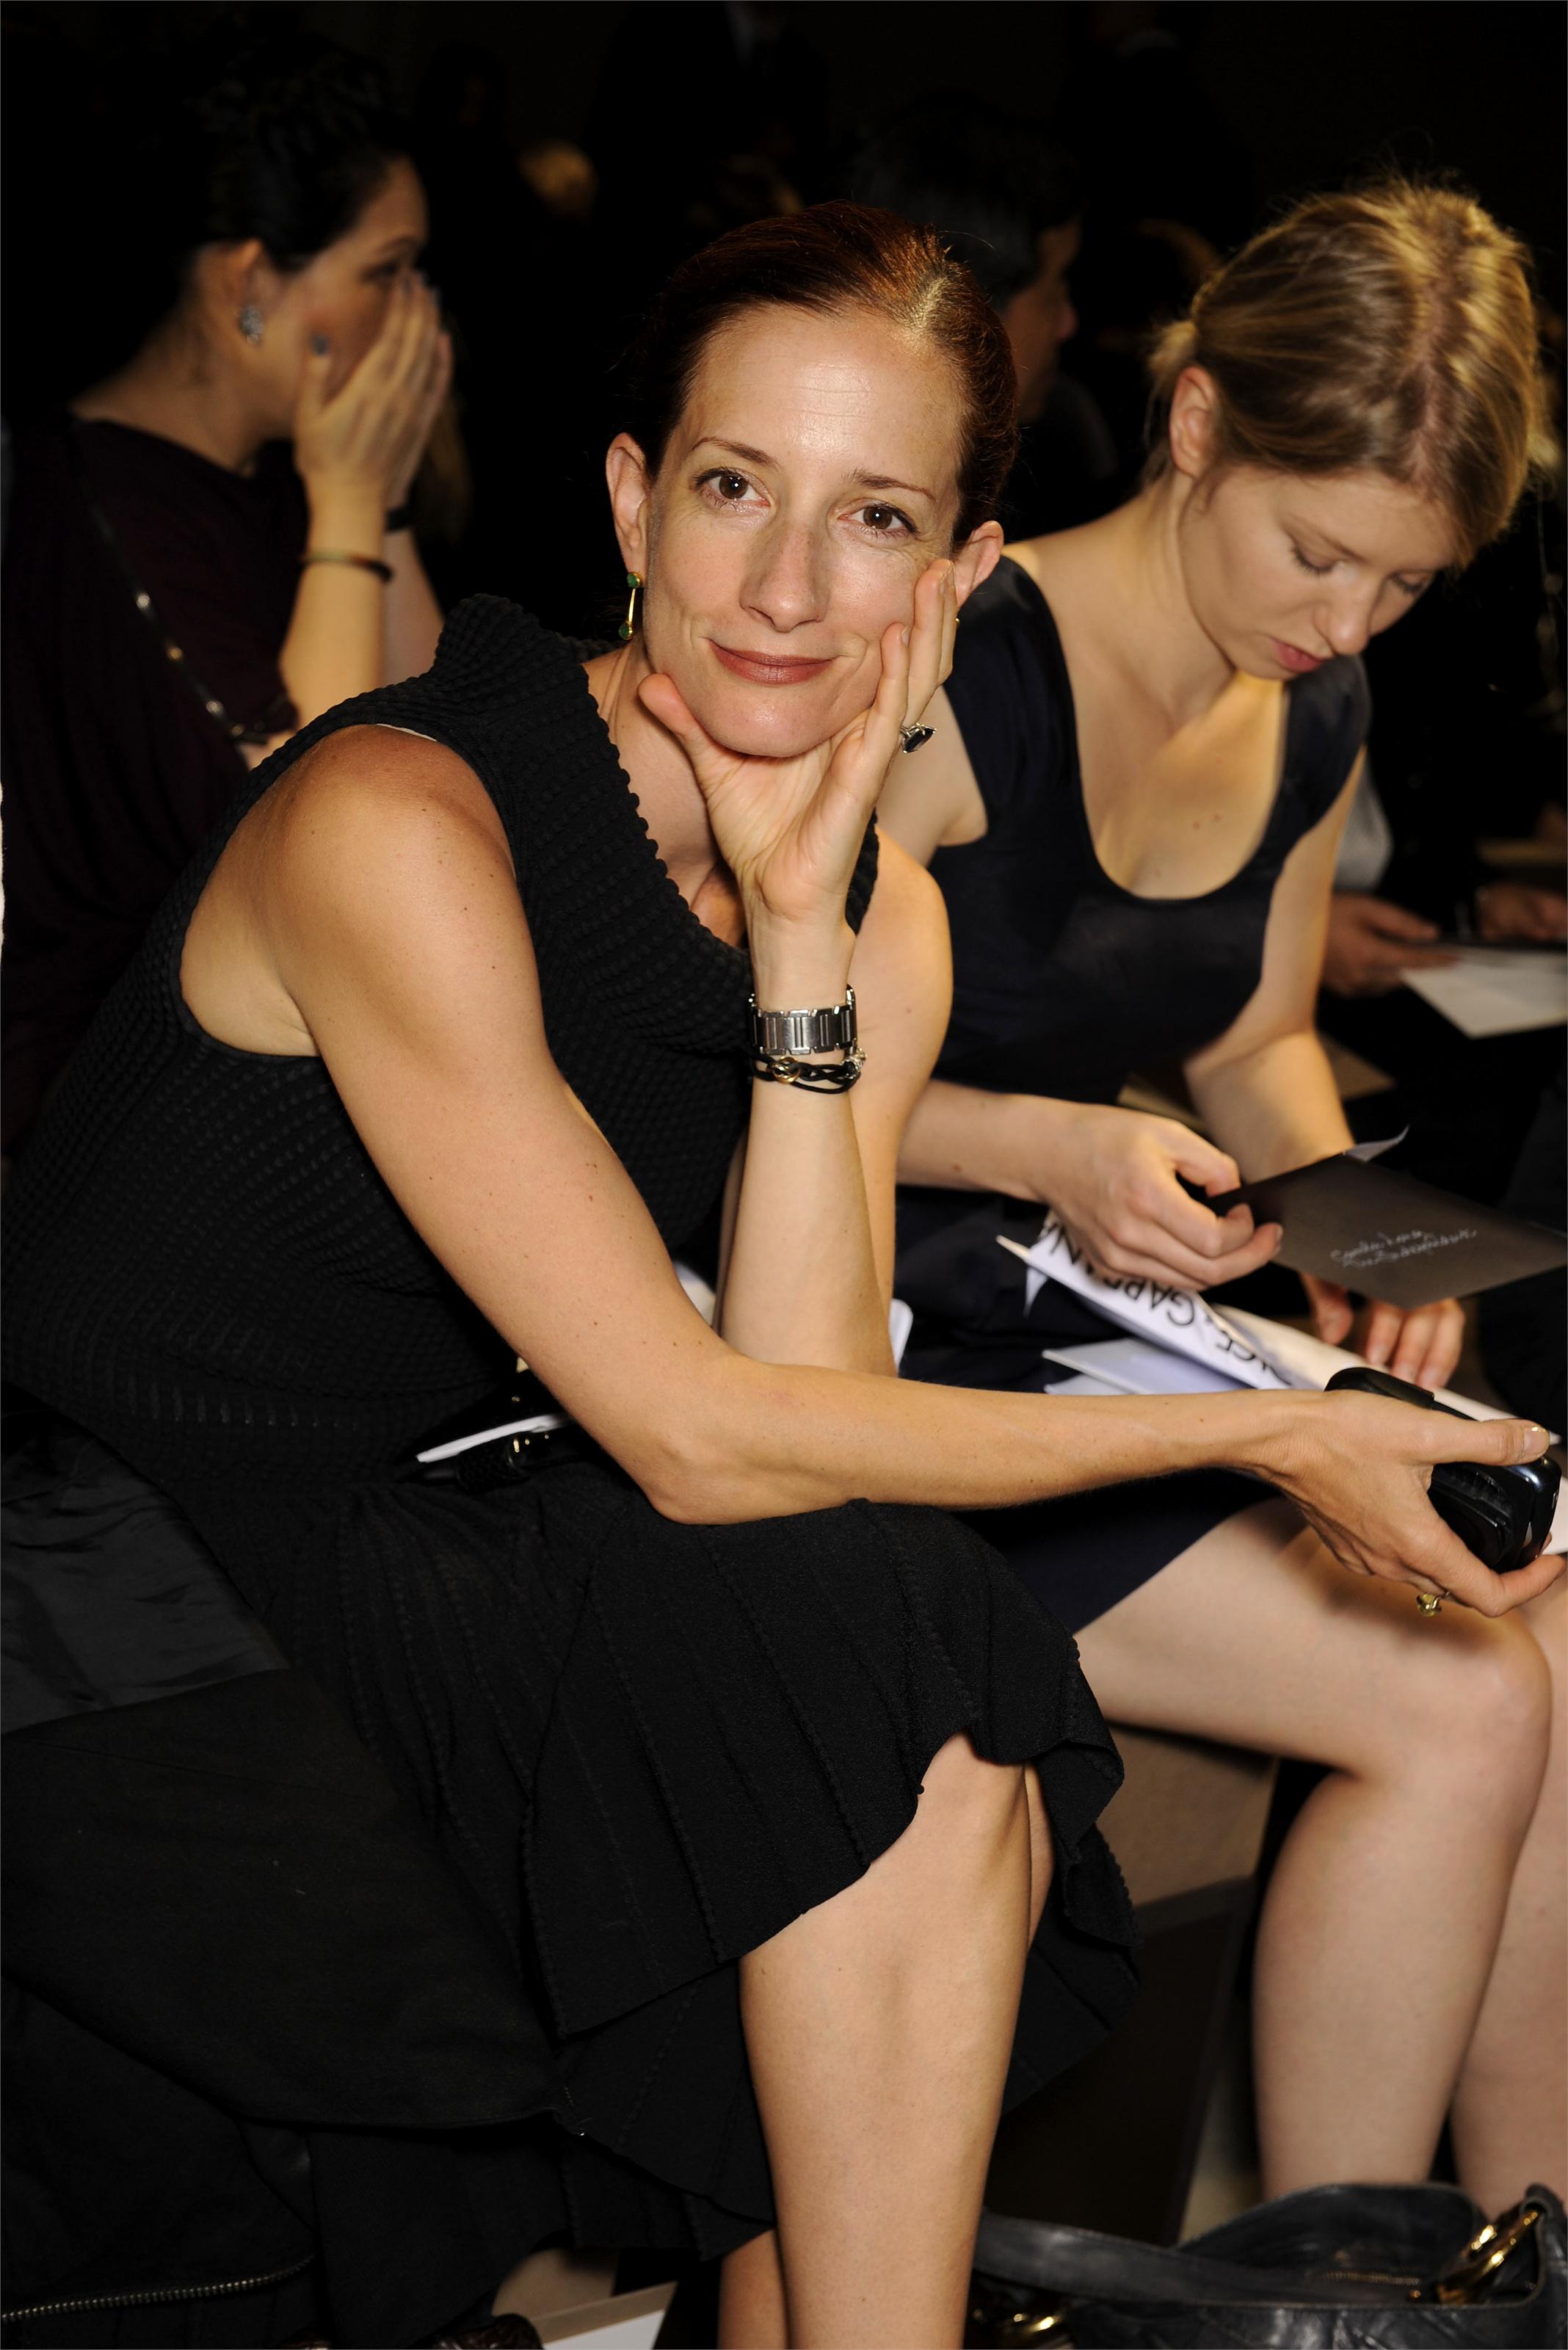 Vanessa Friedman first row at the Bottega Veneta runway show. Courtesy of vebidoo.de